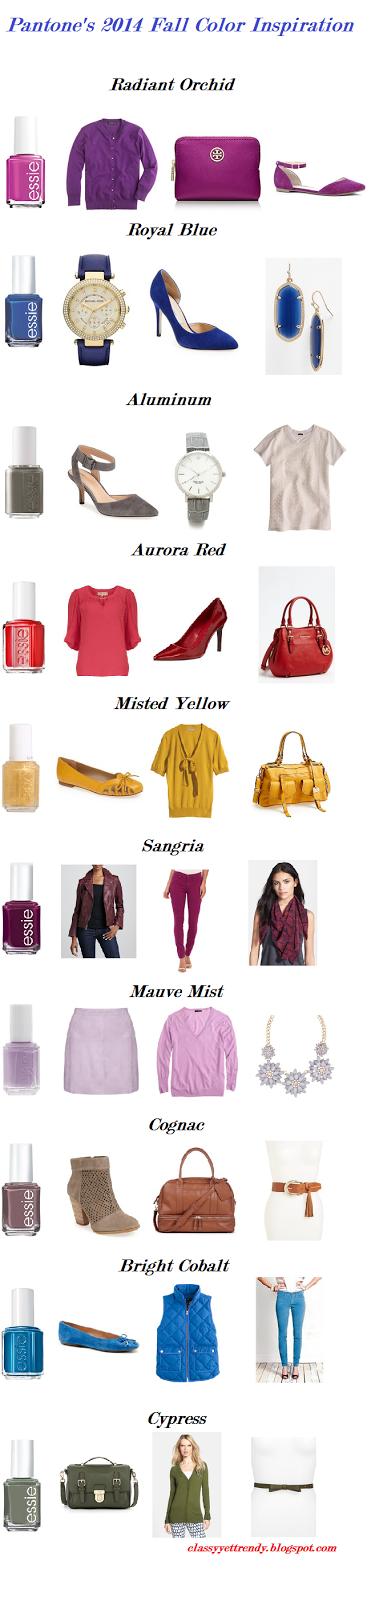 Pantone's 2014 Fall Color Inspiration